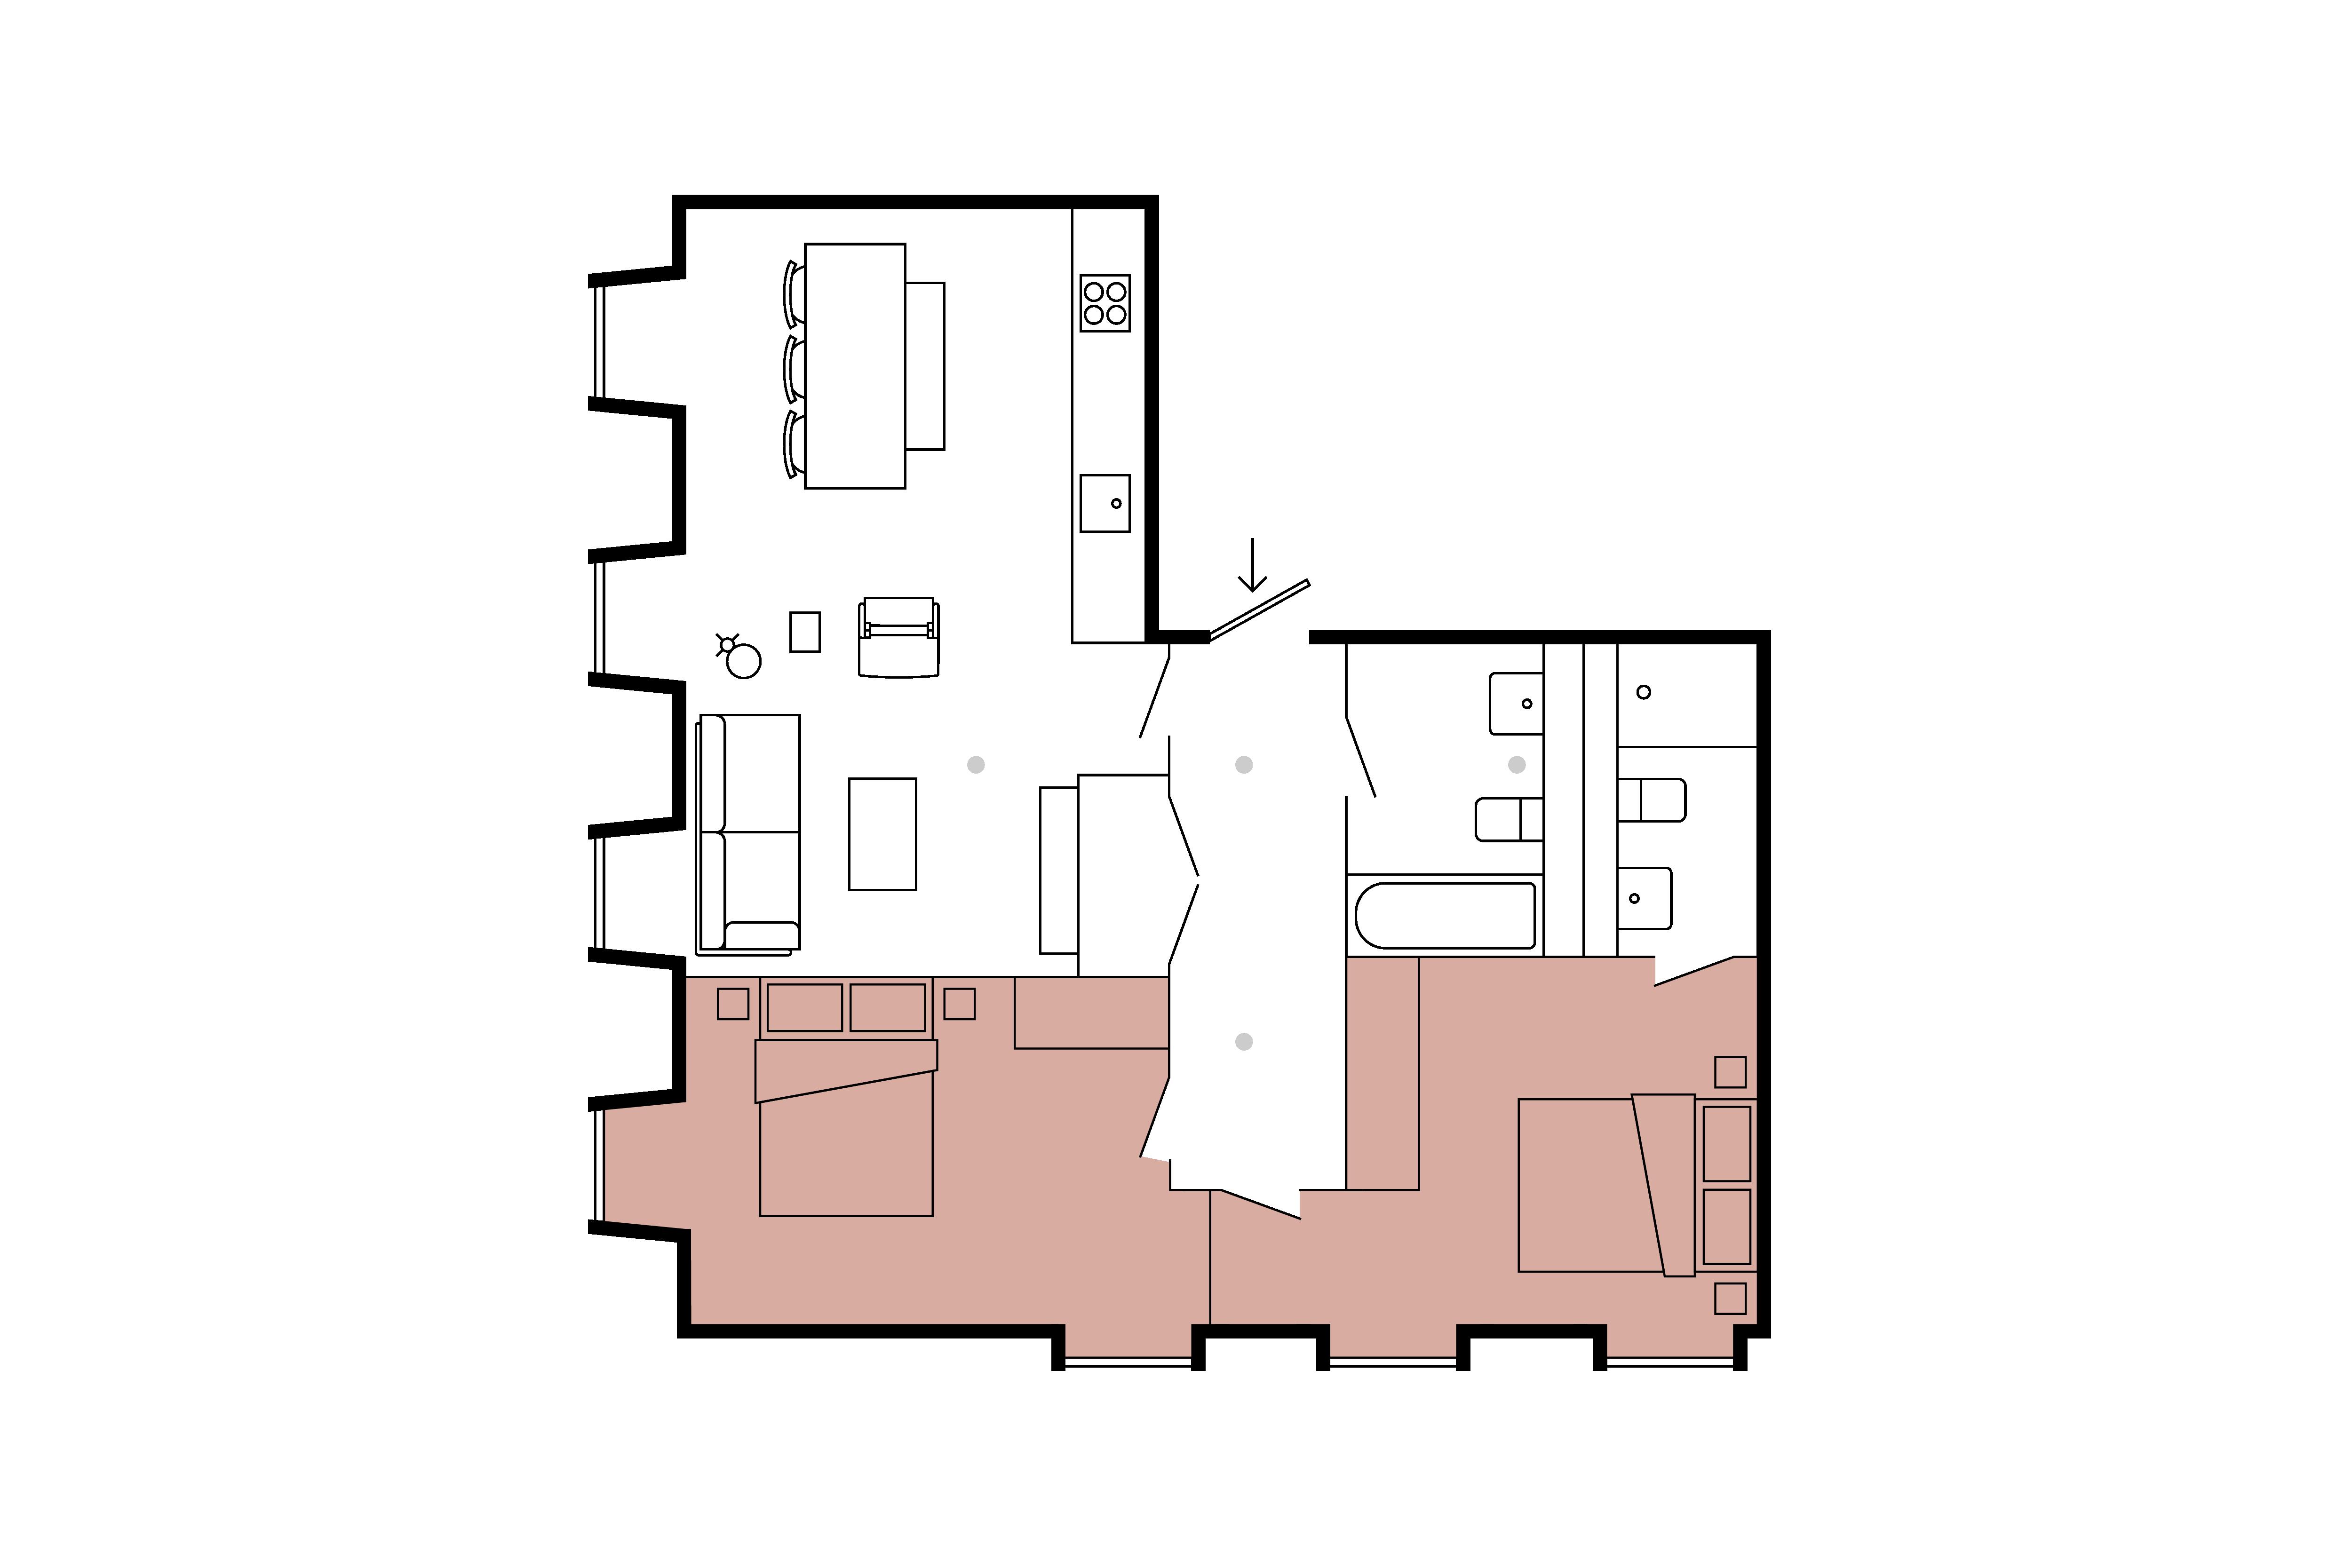 Floor plan for 2 Bed – Minto & Turner